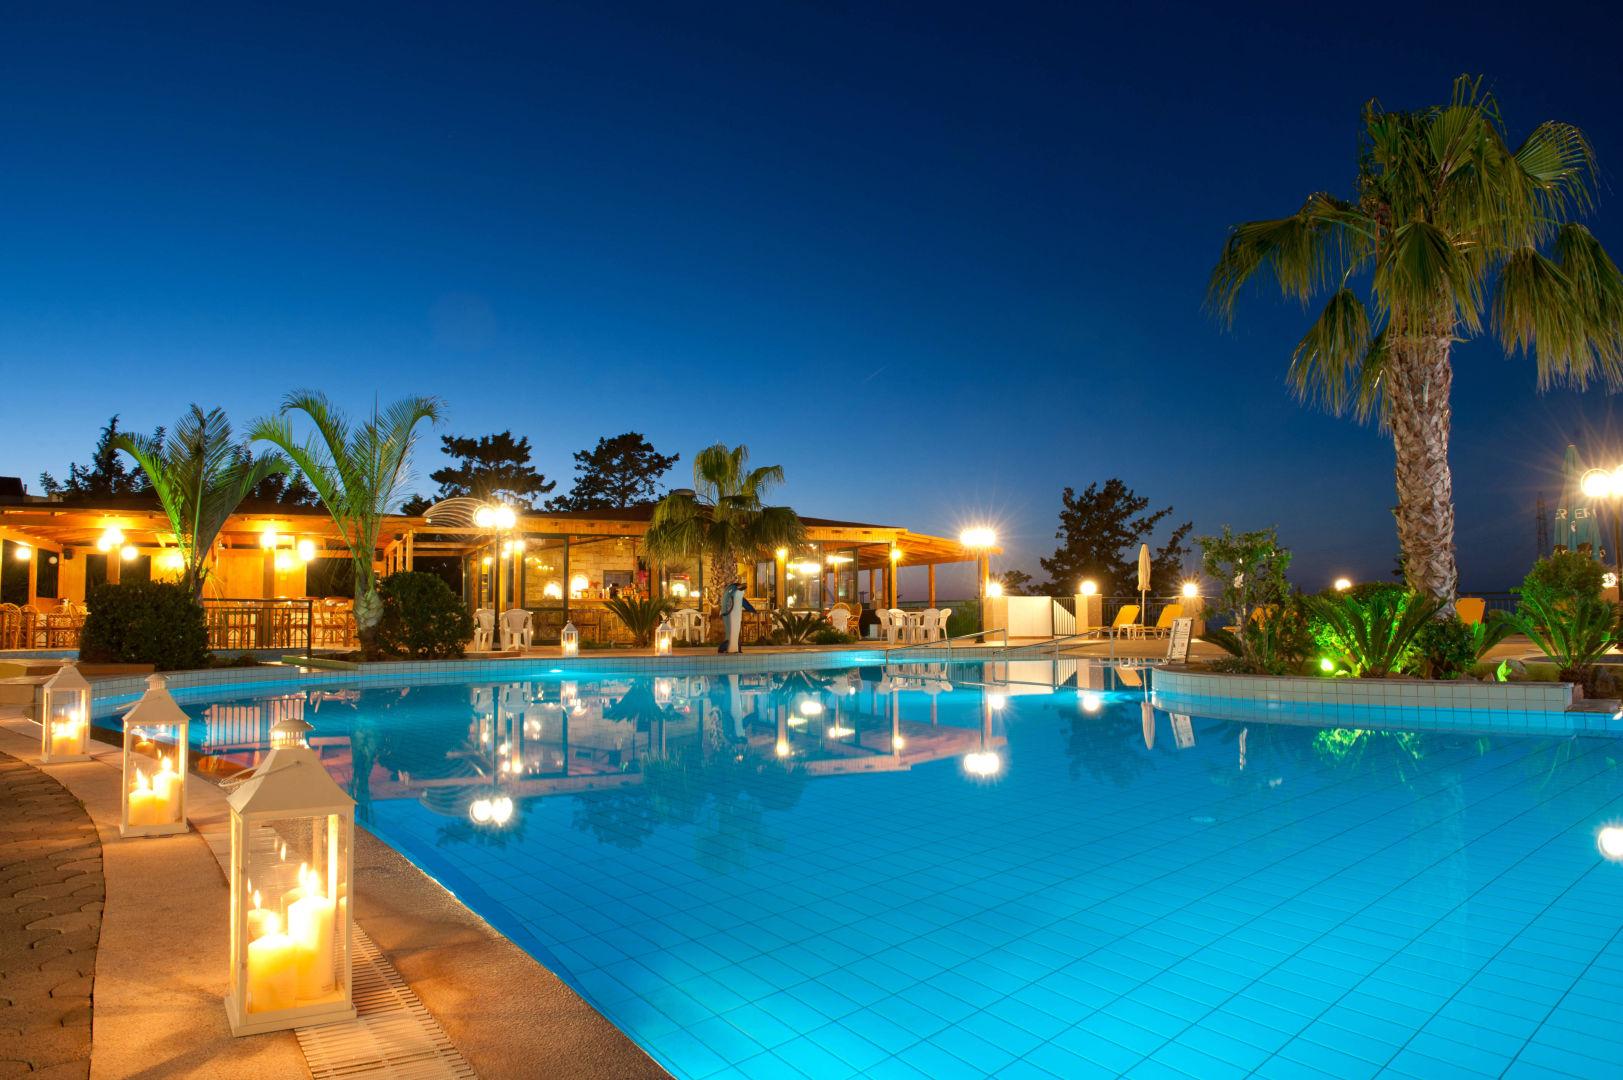 Kurzurlaub auf Kreta: 5 Tage im 4* Studio inkl. Flug, Transfer und Frühstück ab 330€